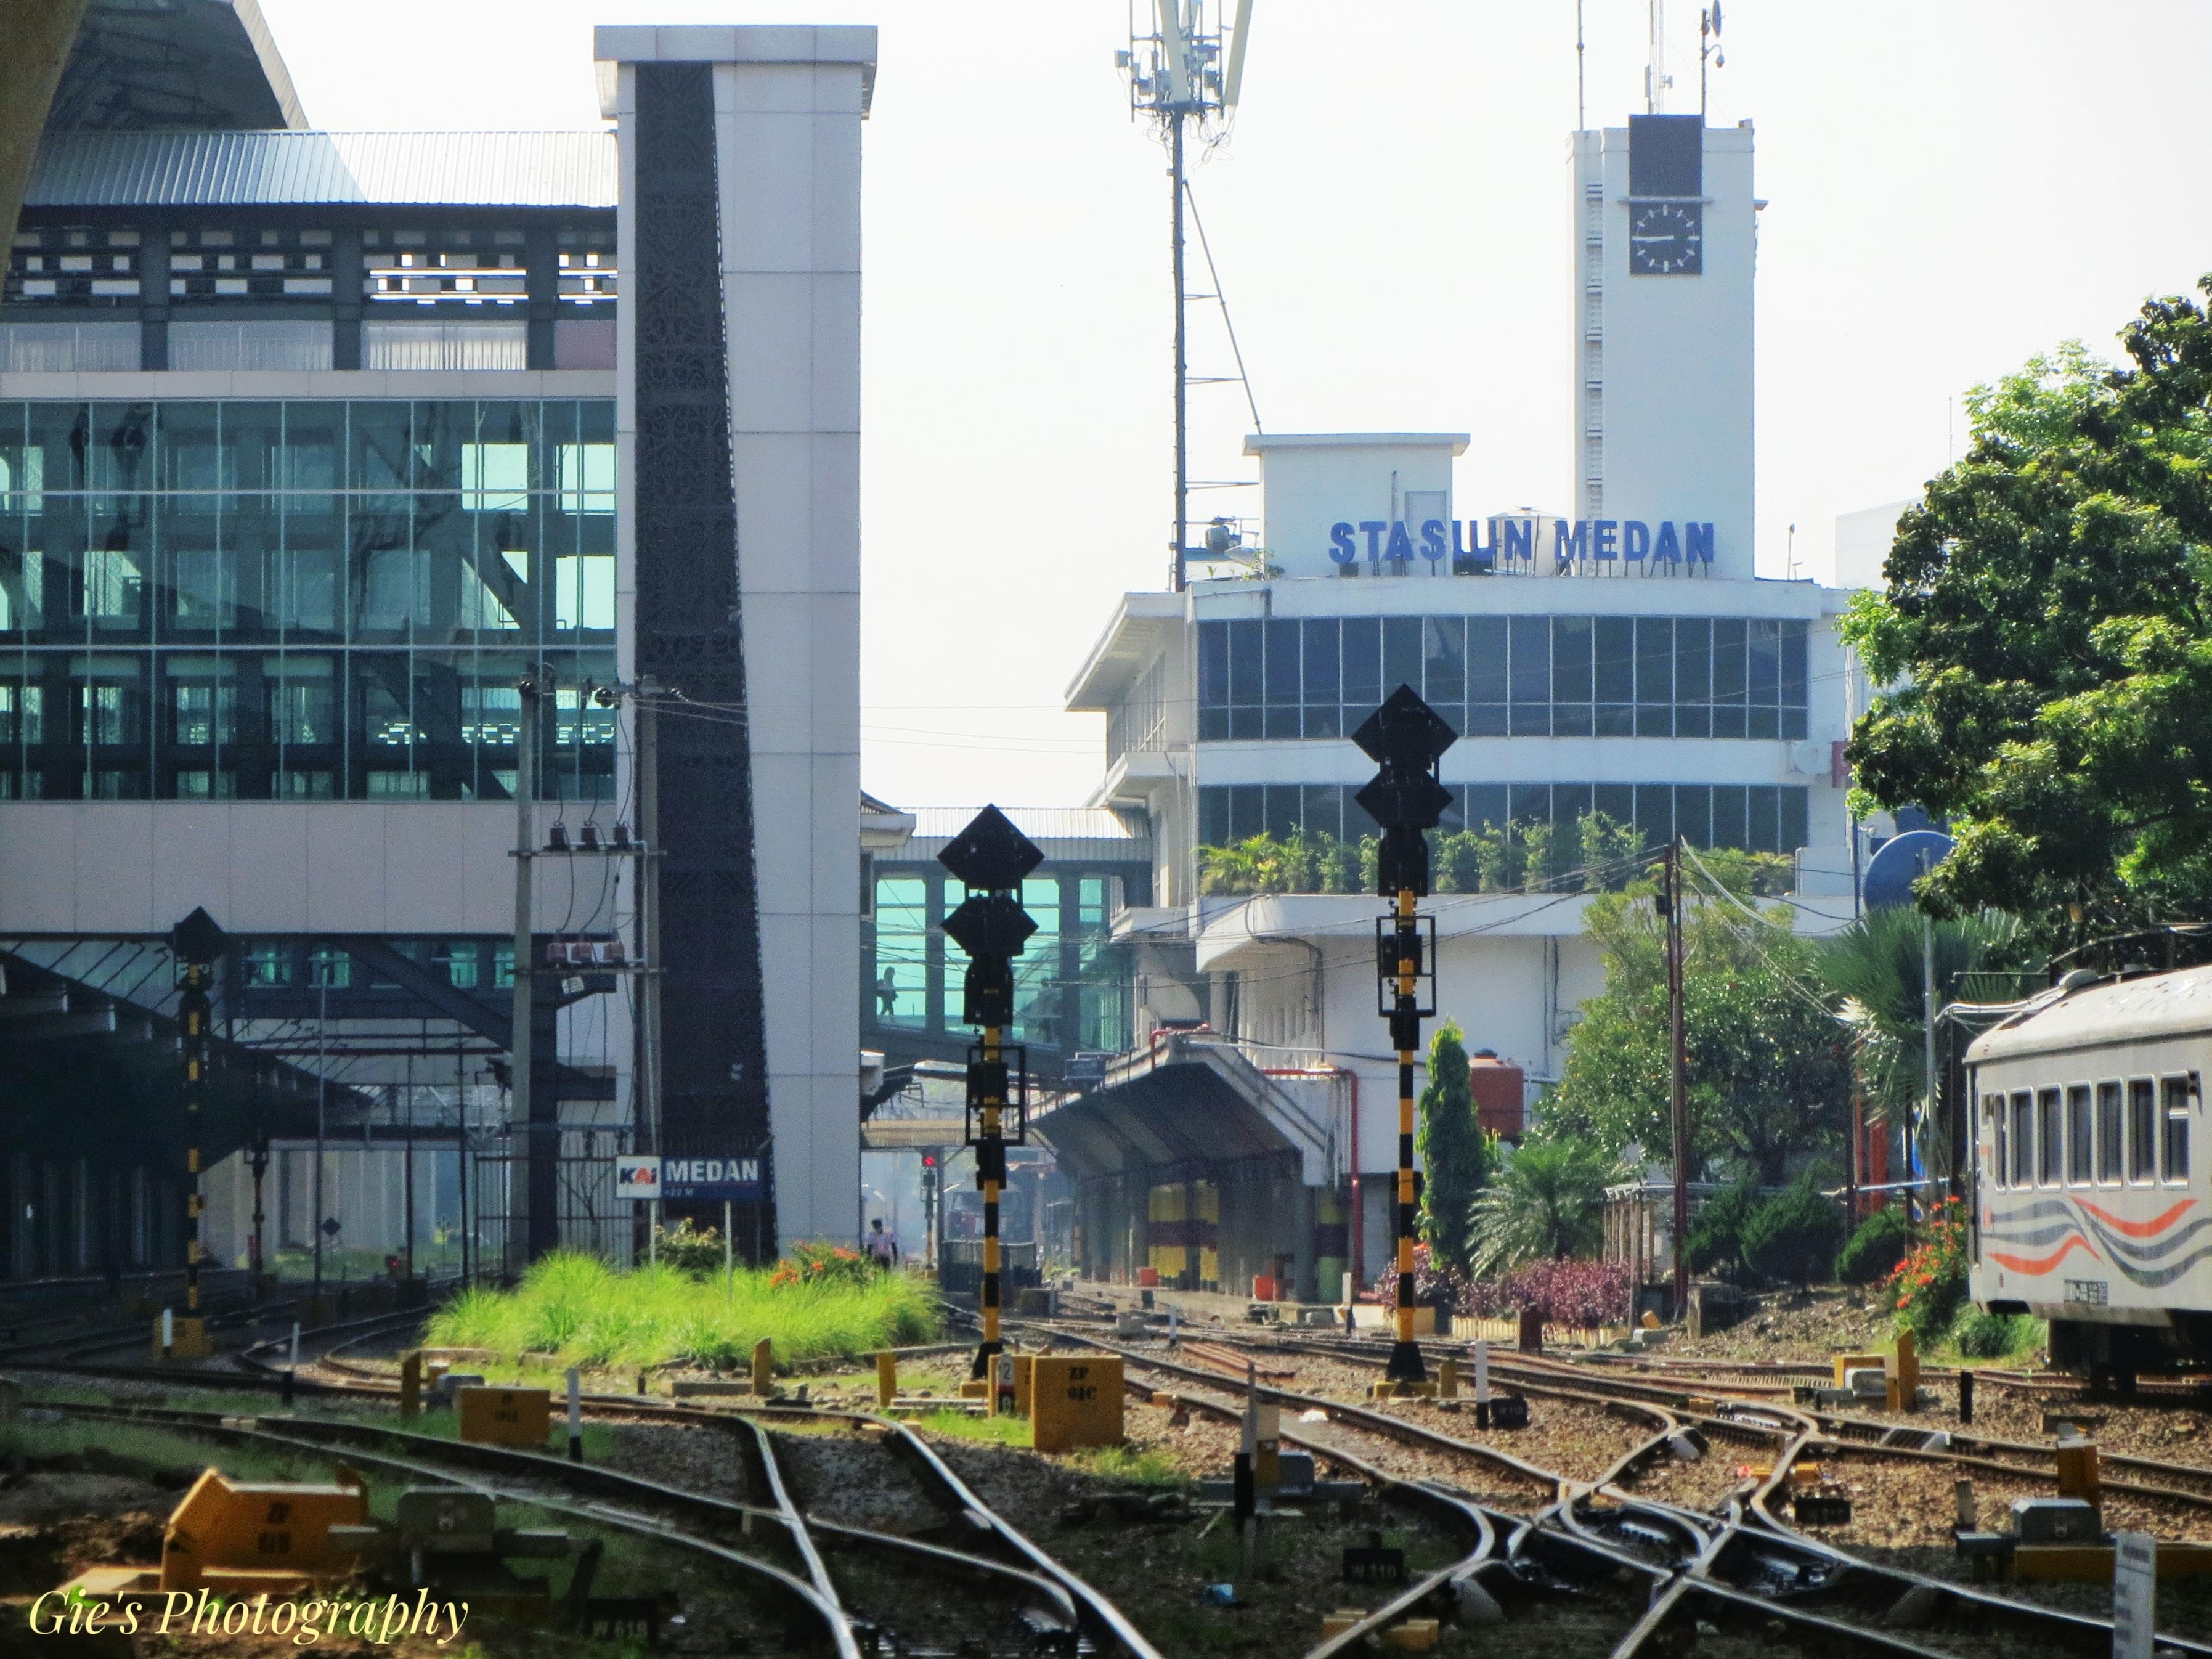 Stasiun Medan Wikipedia Bahasa Indonesia Ensiklopedia Bebas